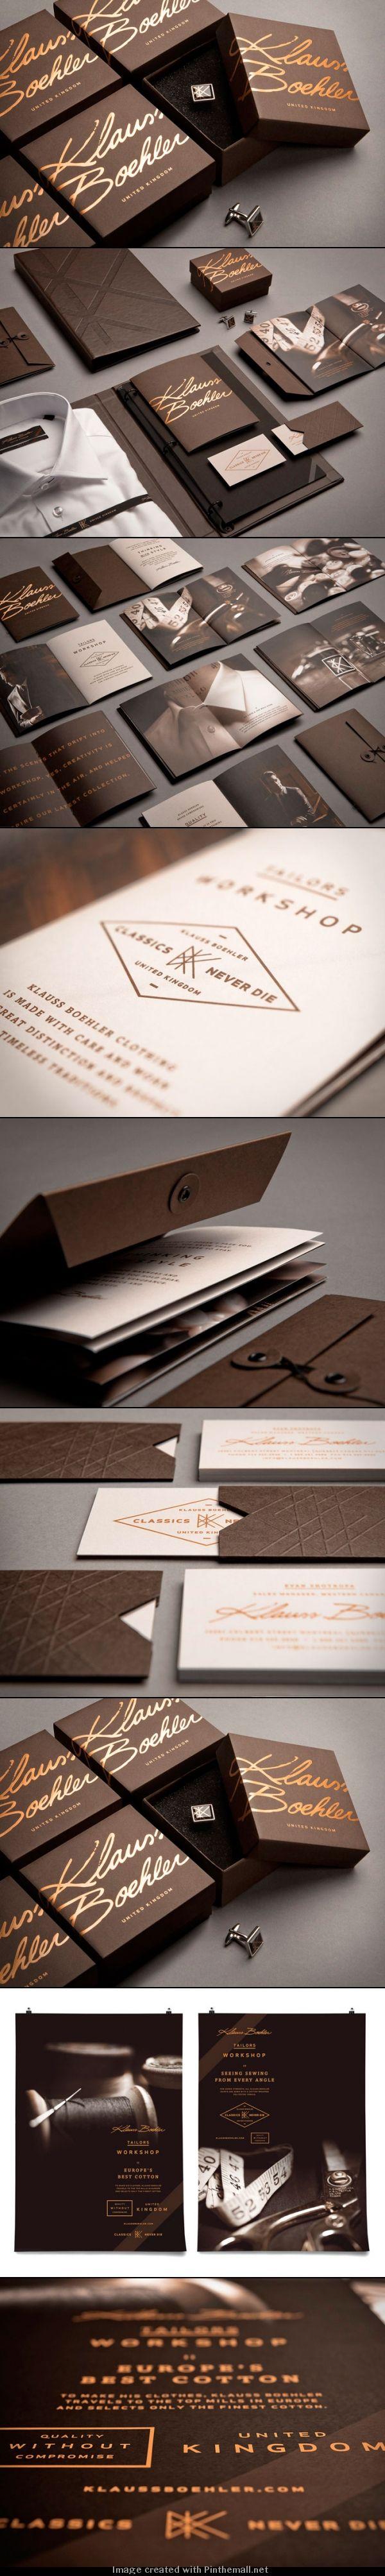 Klauss Boehler #identity #packaging #branding #design